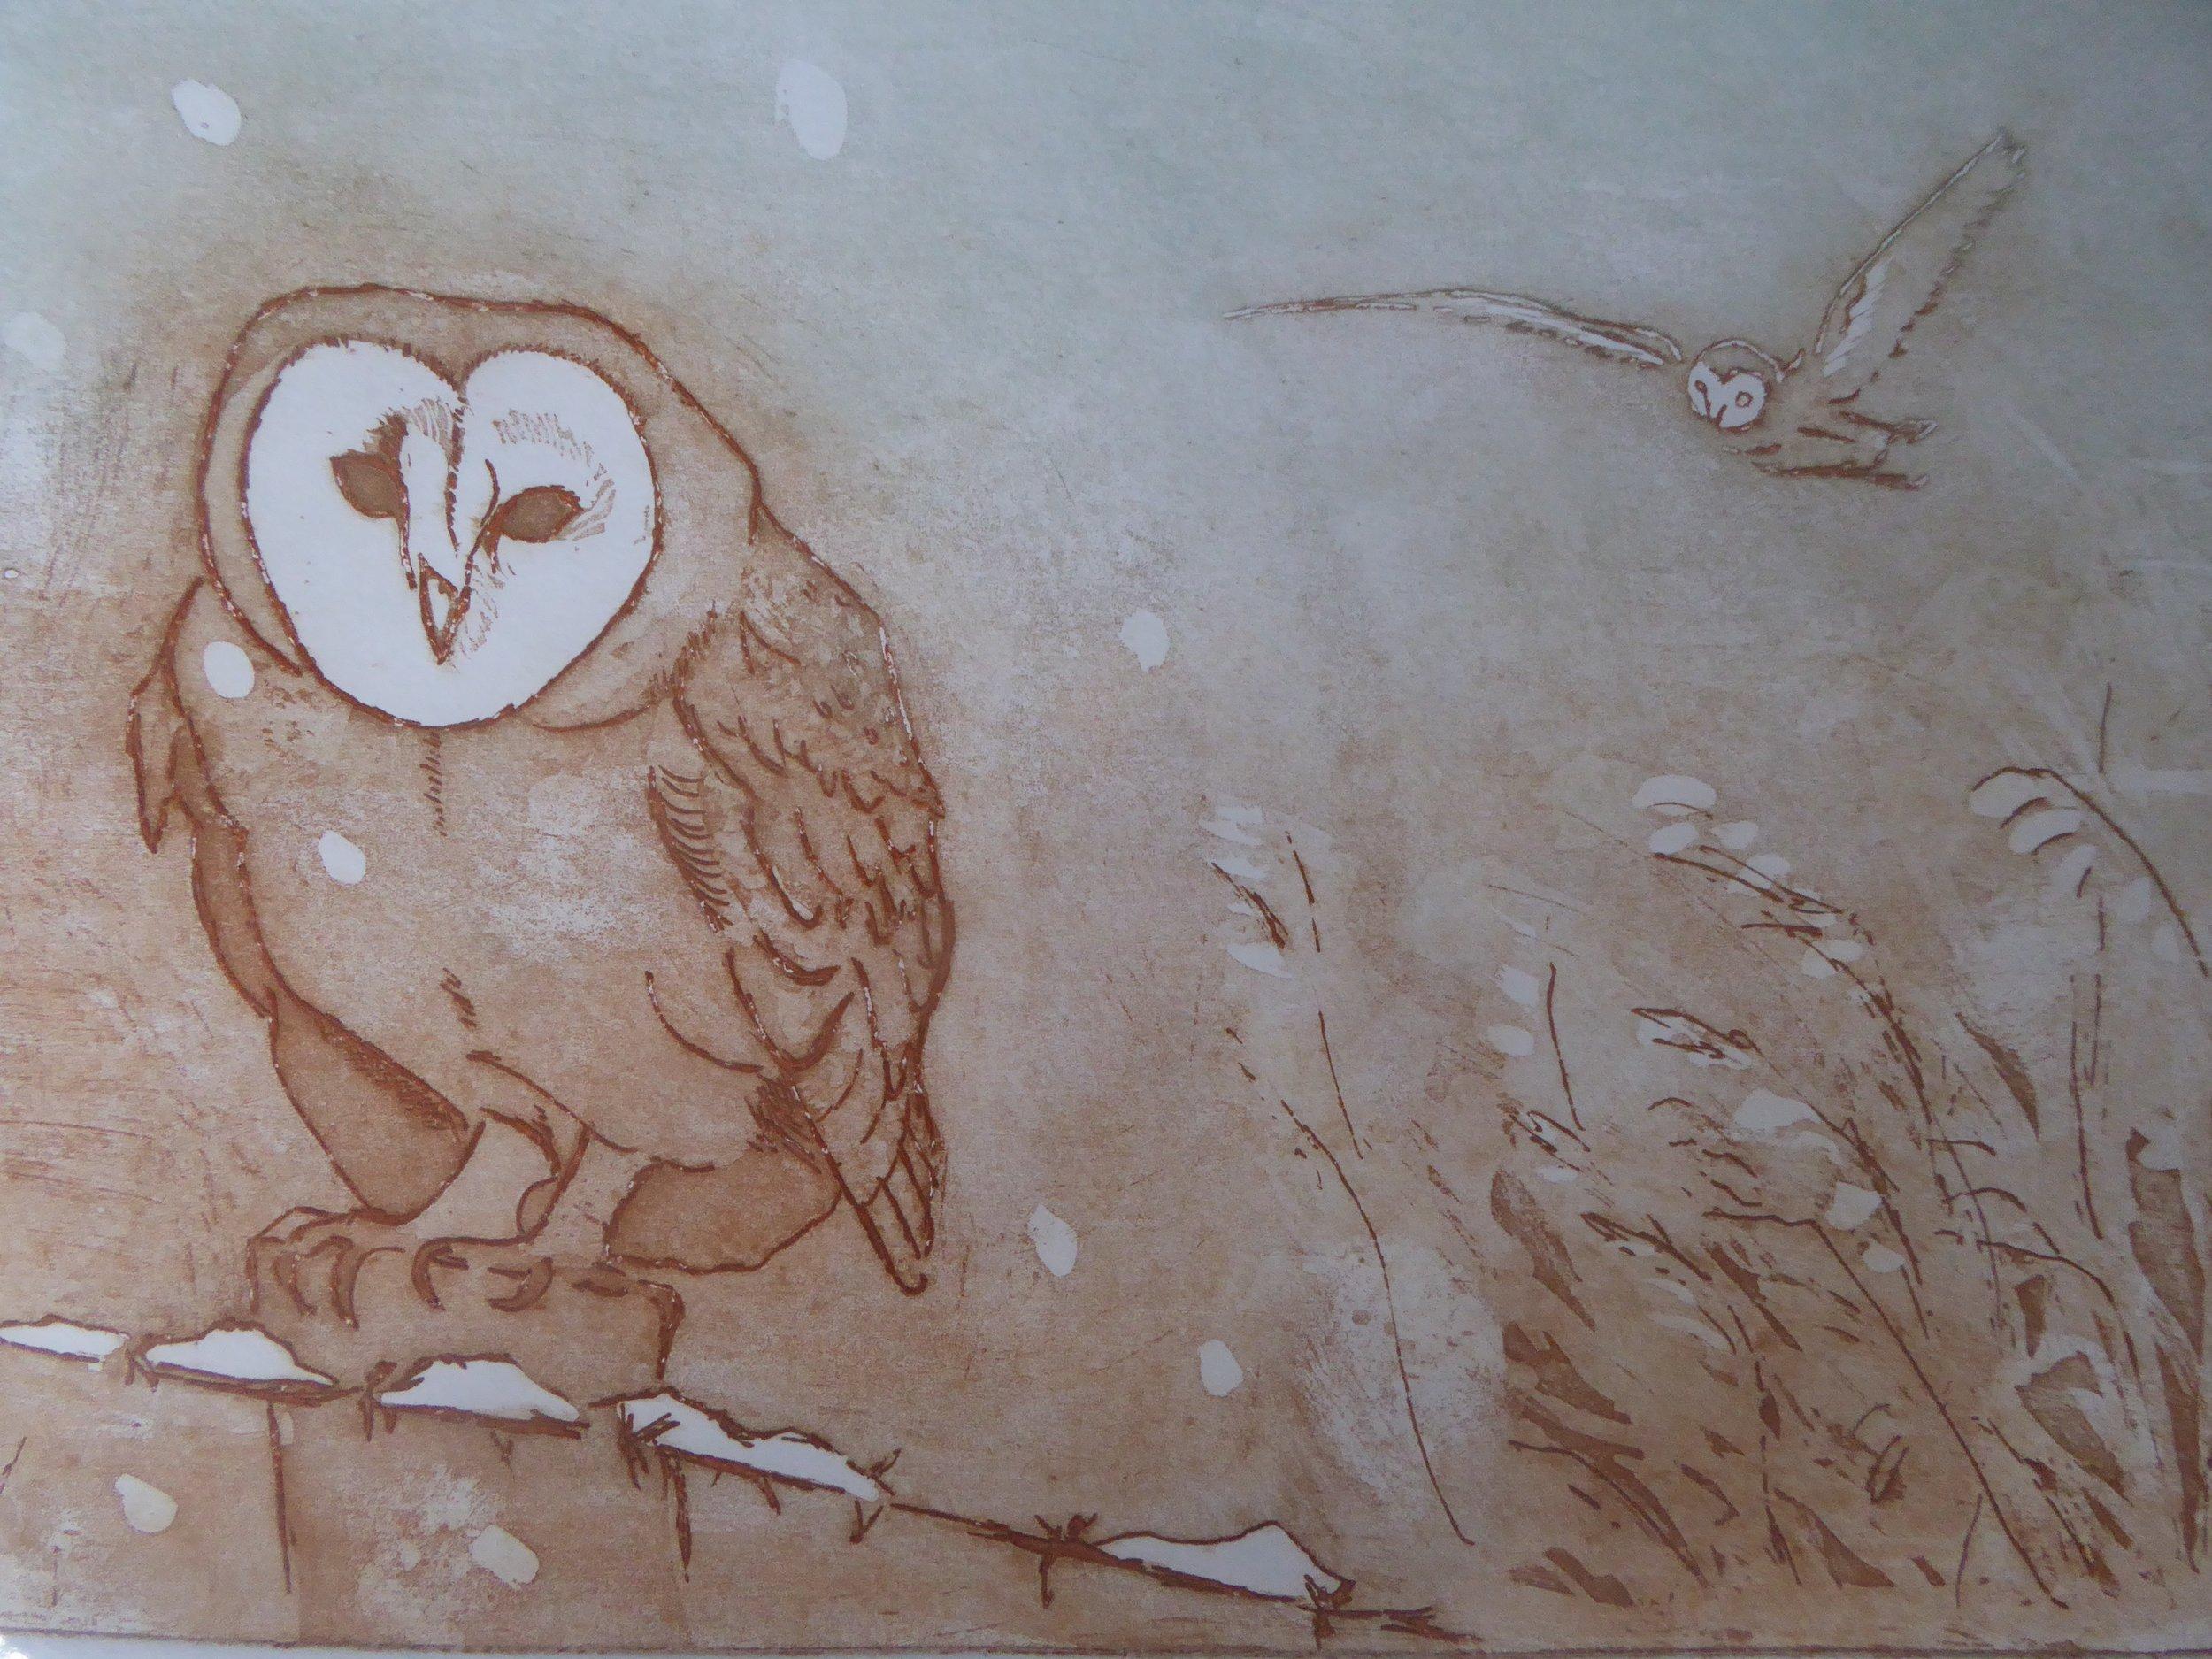 Wintery Owl - 41 x 57cm (unframed)